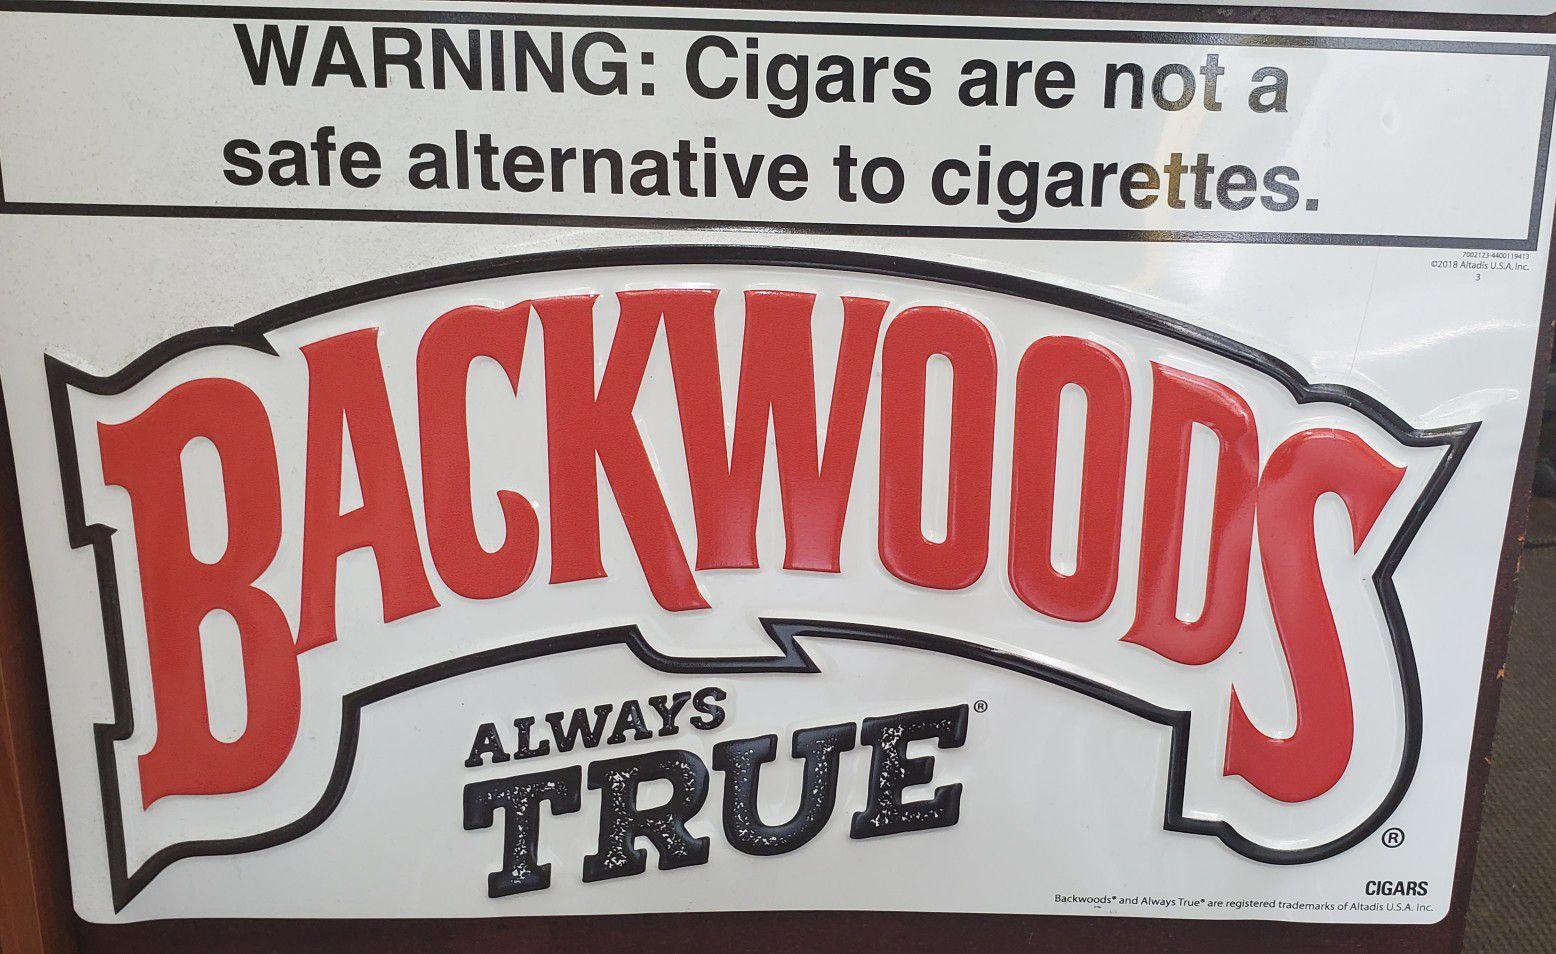 Authentic Blackwoods sign